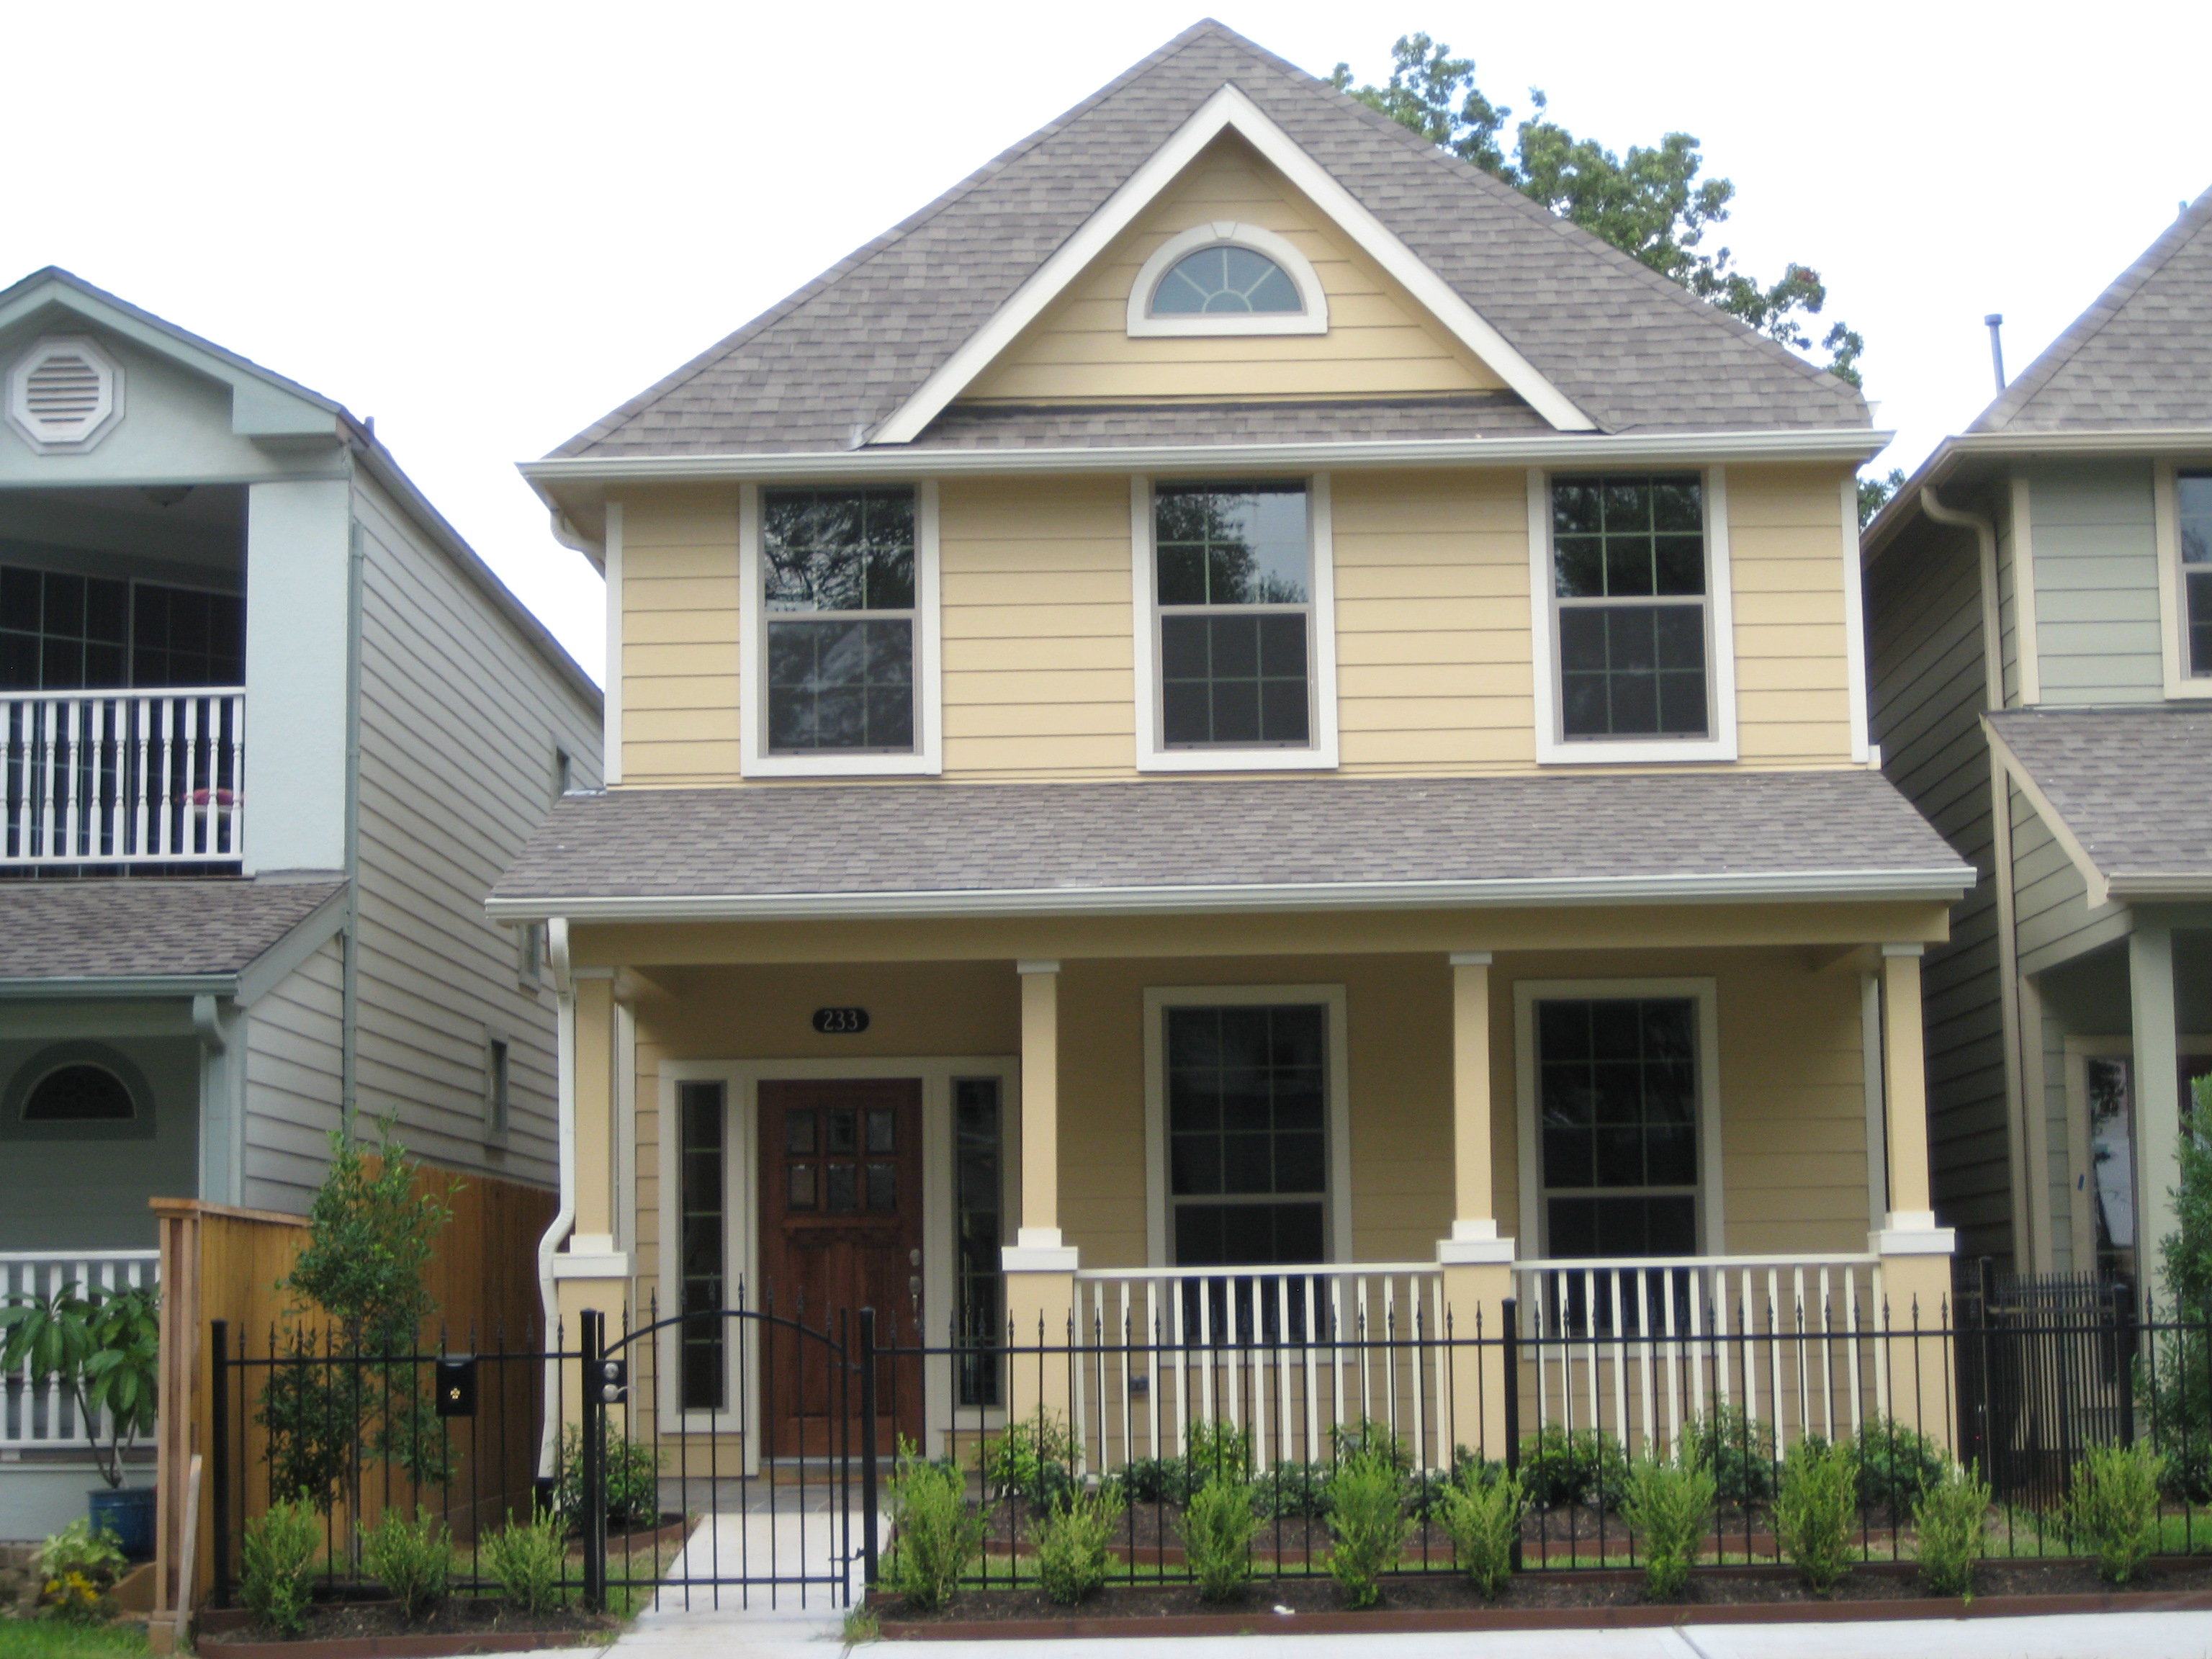 Best Kitchen Gallery: Houston Heights W 21st Street Now Available Sandcastle Homes of Sandcastle Homes Houston on rachelxblog.com